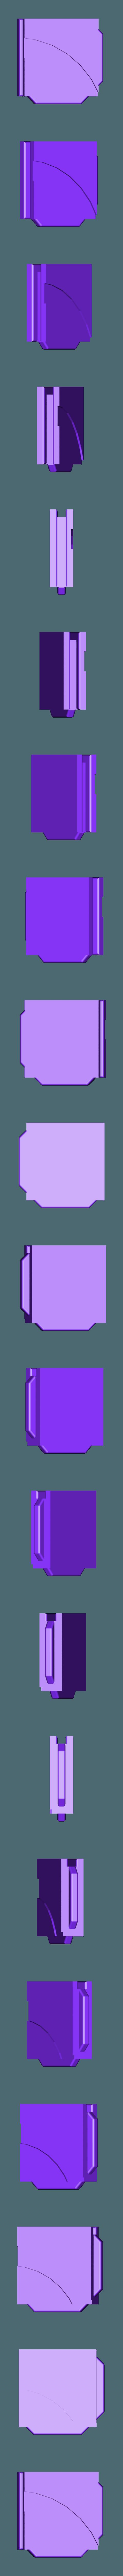 Piece - Part 15.stl Download free STL file Taquin CULTS / Sliding Puzzle • 3D print model, Valelab3D